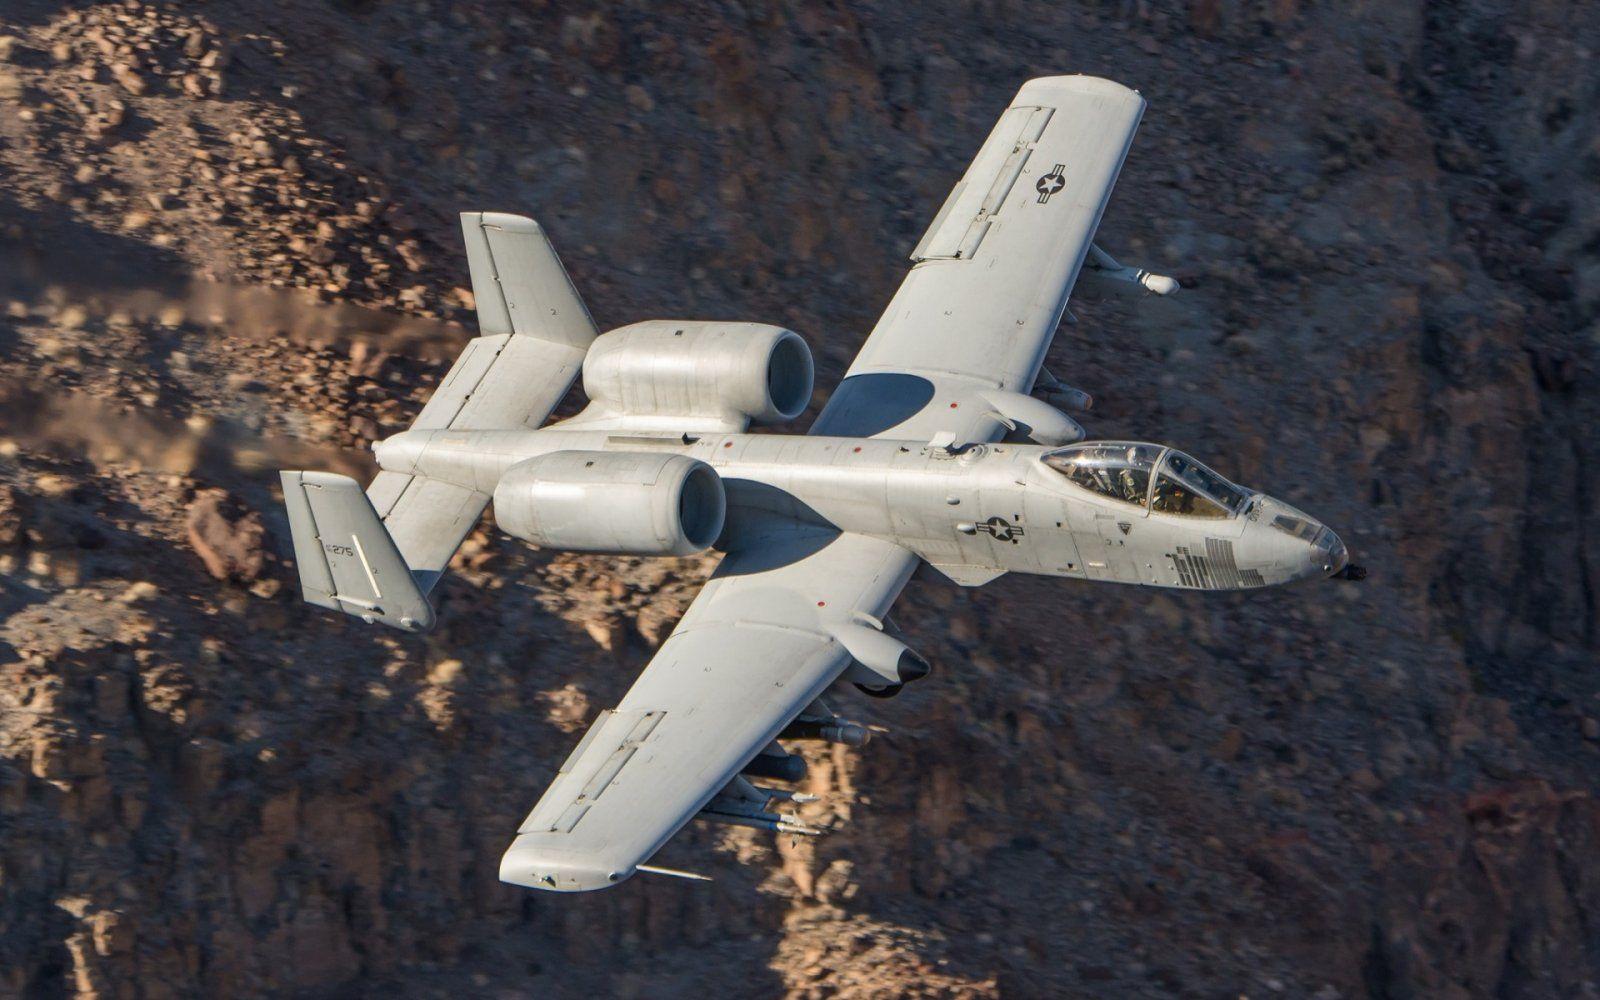 fairchild-republic-a-10-thunderbolt-ii-a-10c-american-attack-aircraft-usaf-us-military-aircraft.jpg